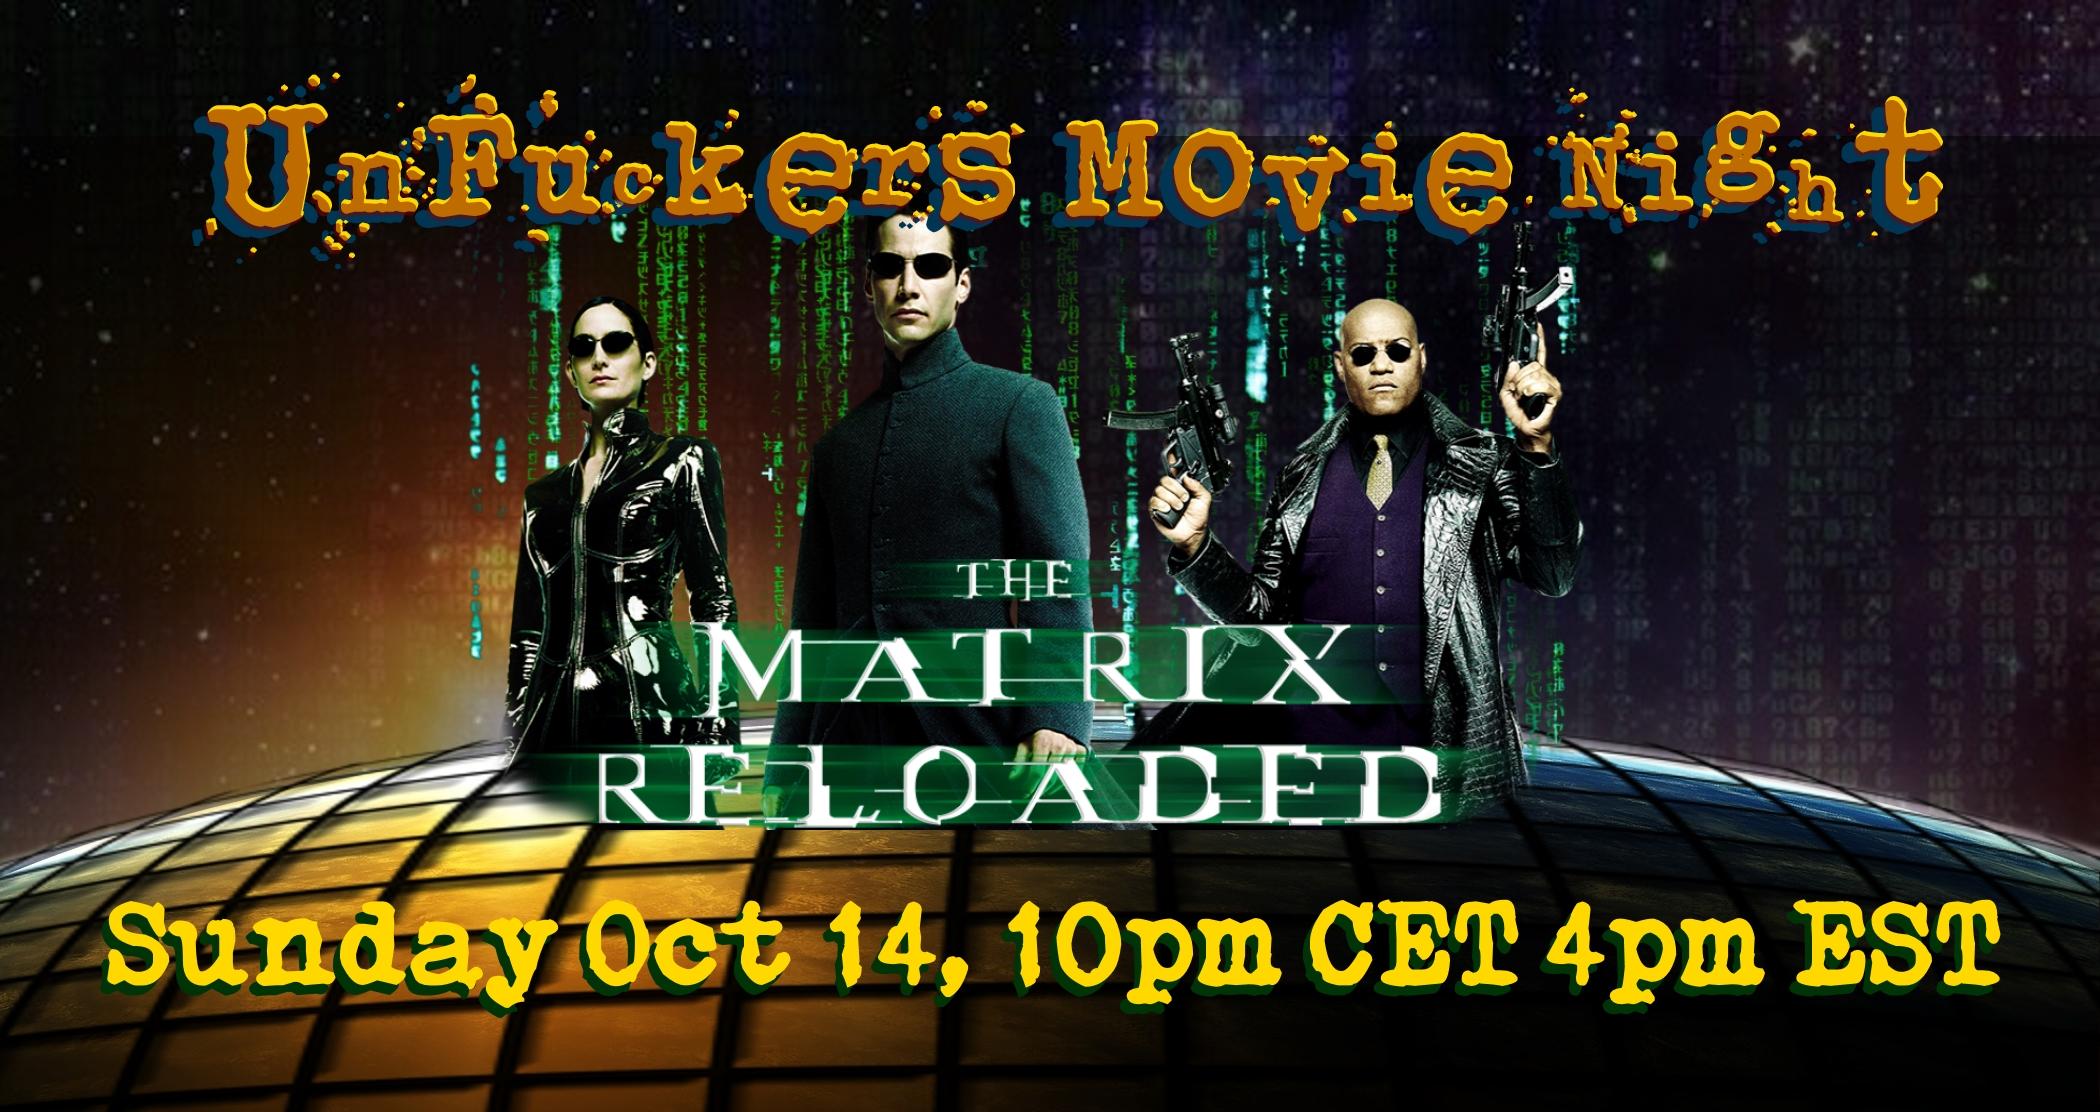 unfuckers movie night the matrix reloaded